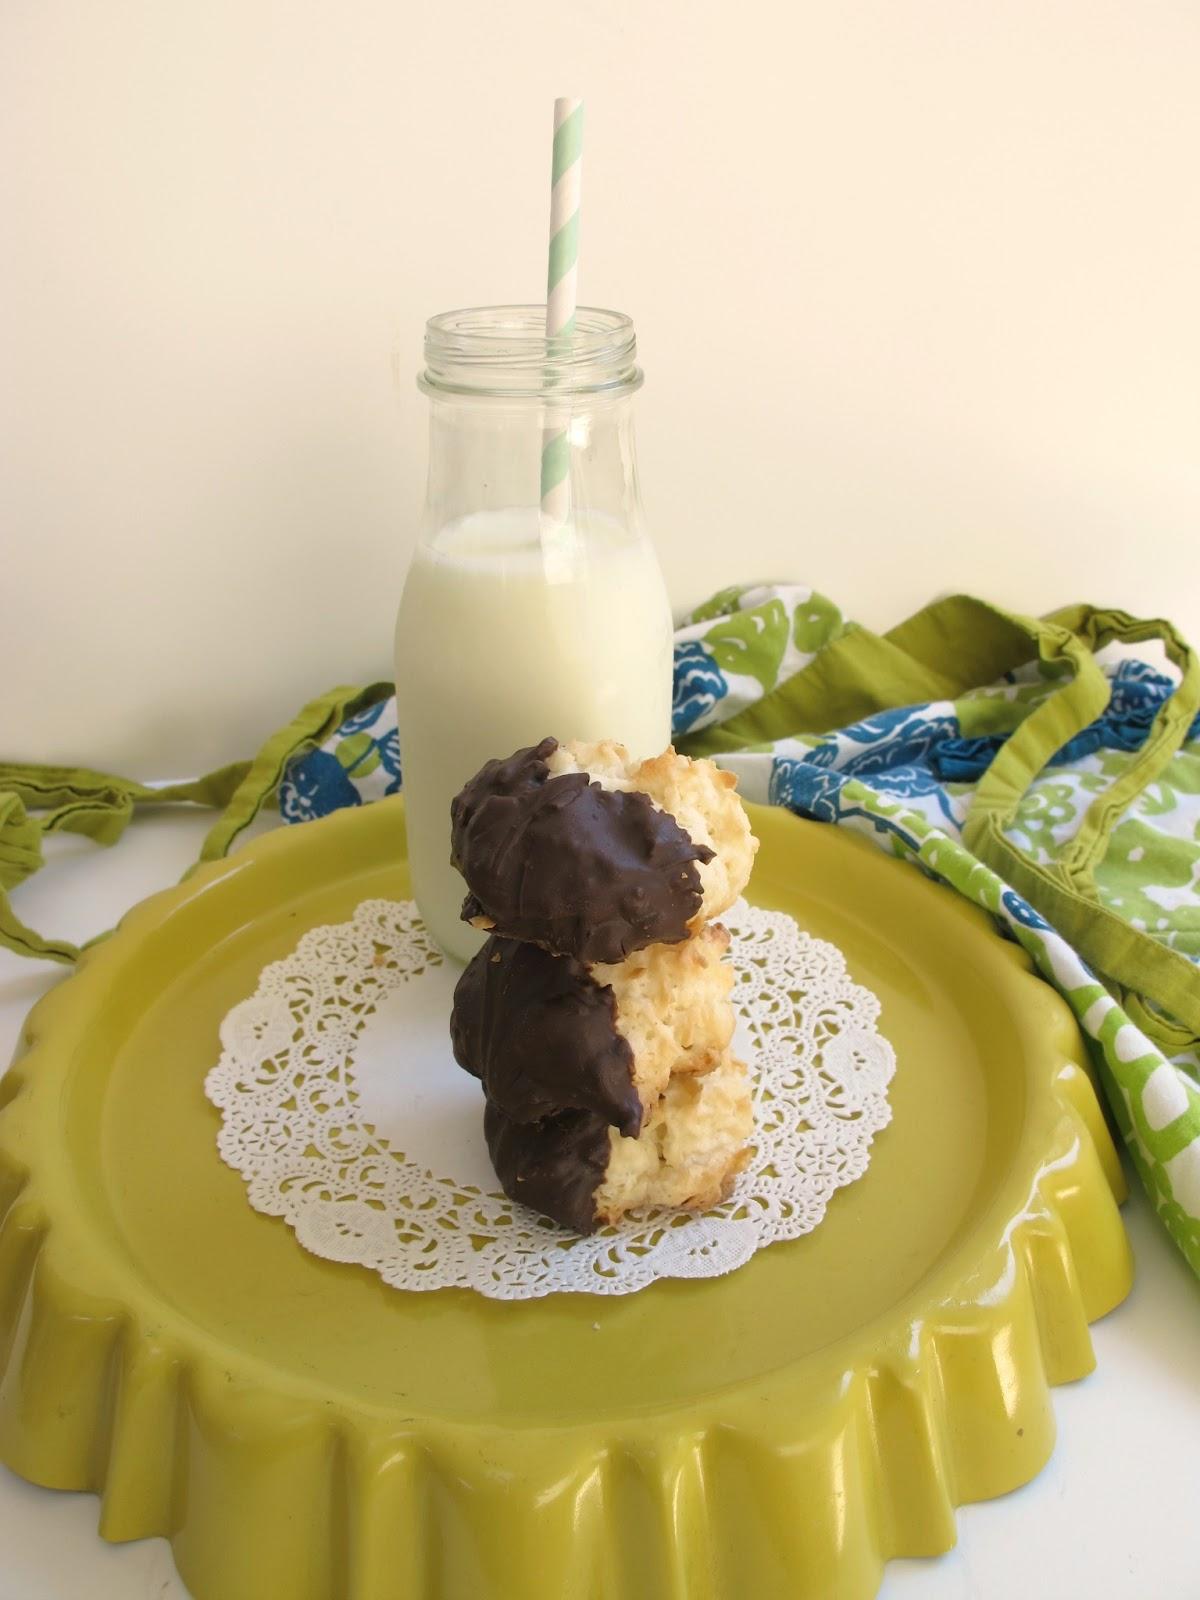 Whipple Scrumptious: Coconut Macaroon Recipe